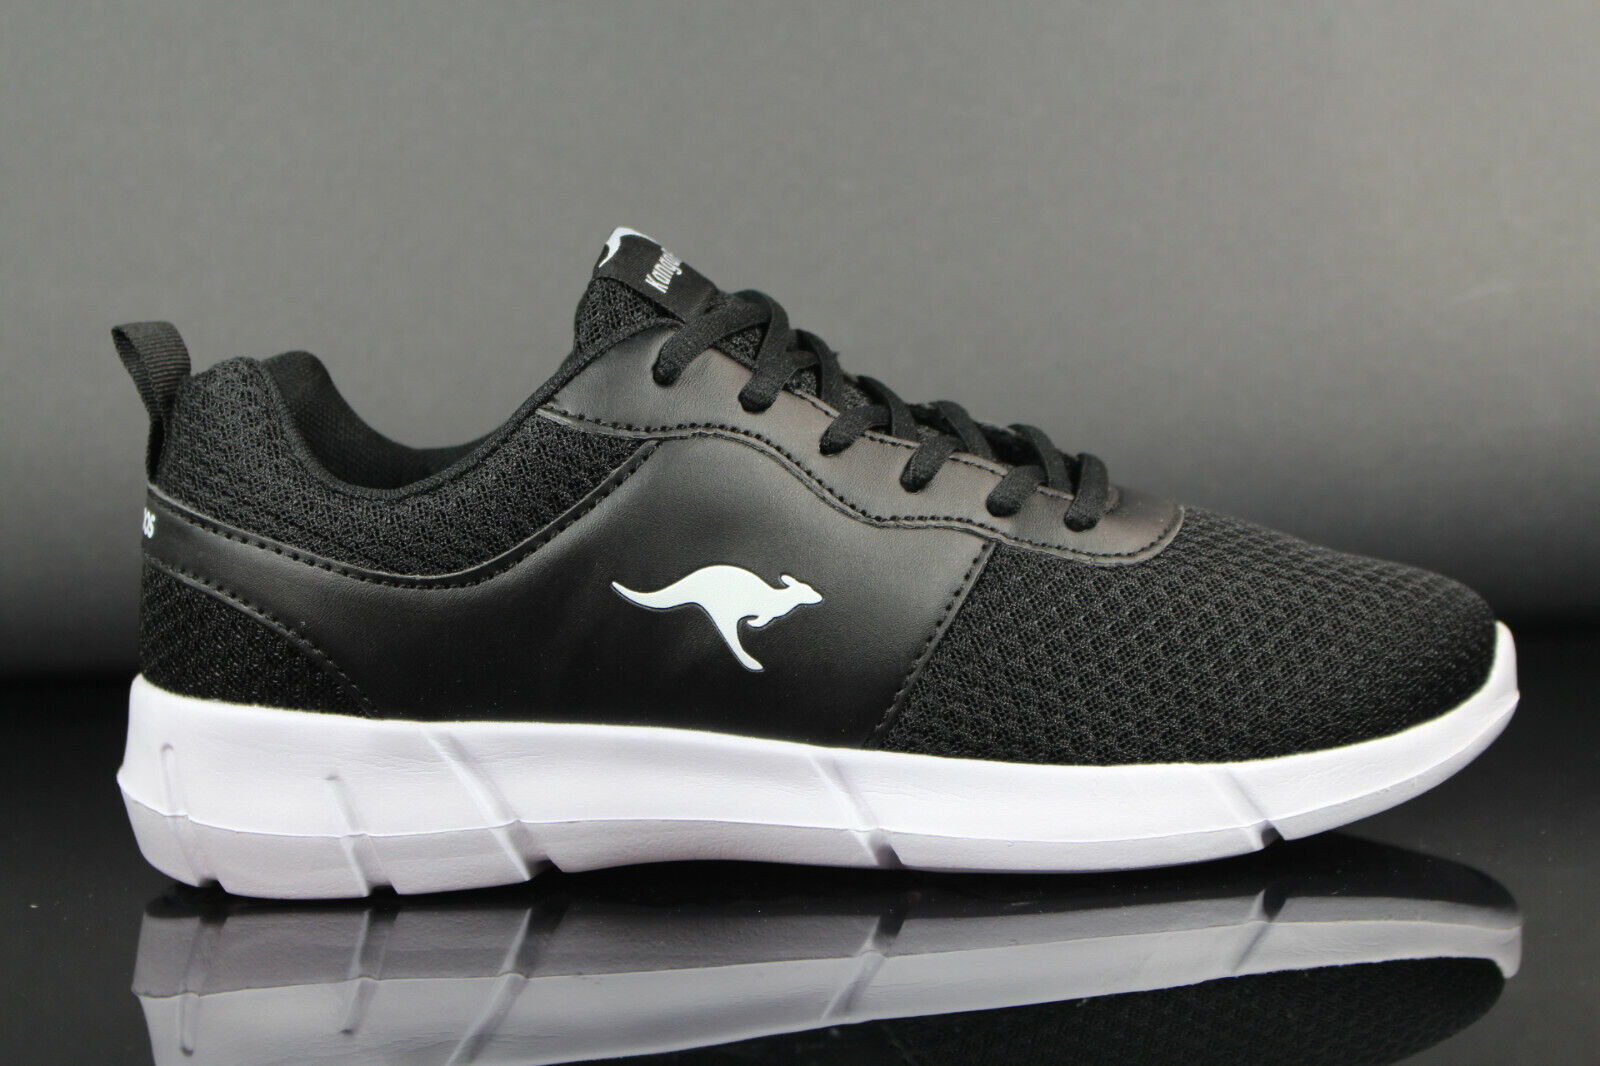 Neu KangaRoos Saba Jet Herren Sneaker Sportschuhe Schuhe Turnschuhe 790330005001